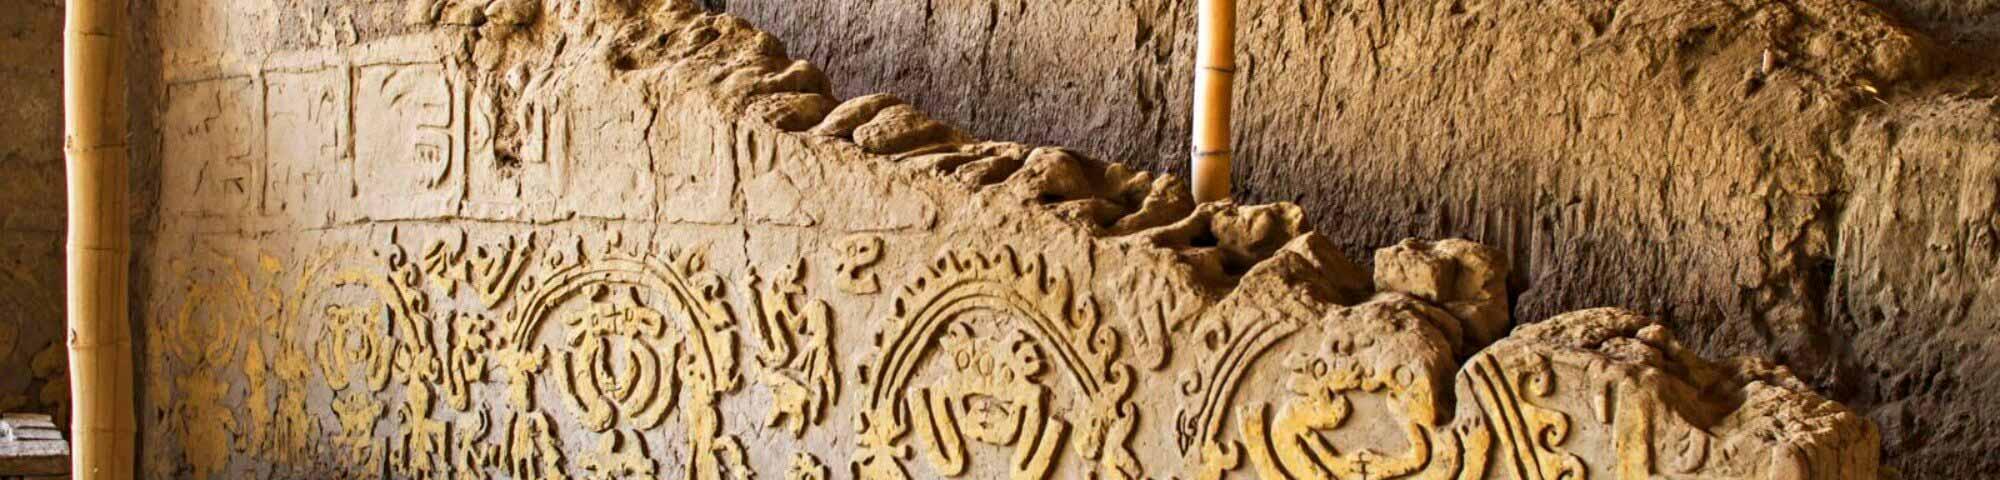 Complejo Arqueológico Huaca Chotuna - Chornancap